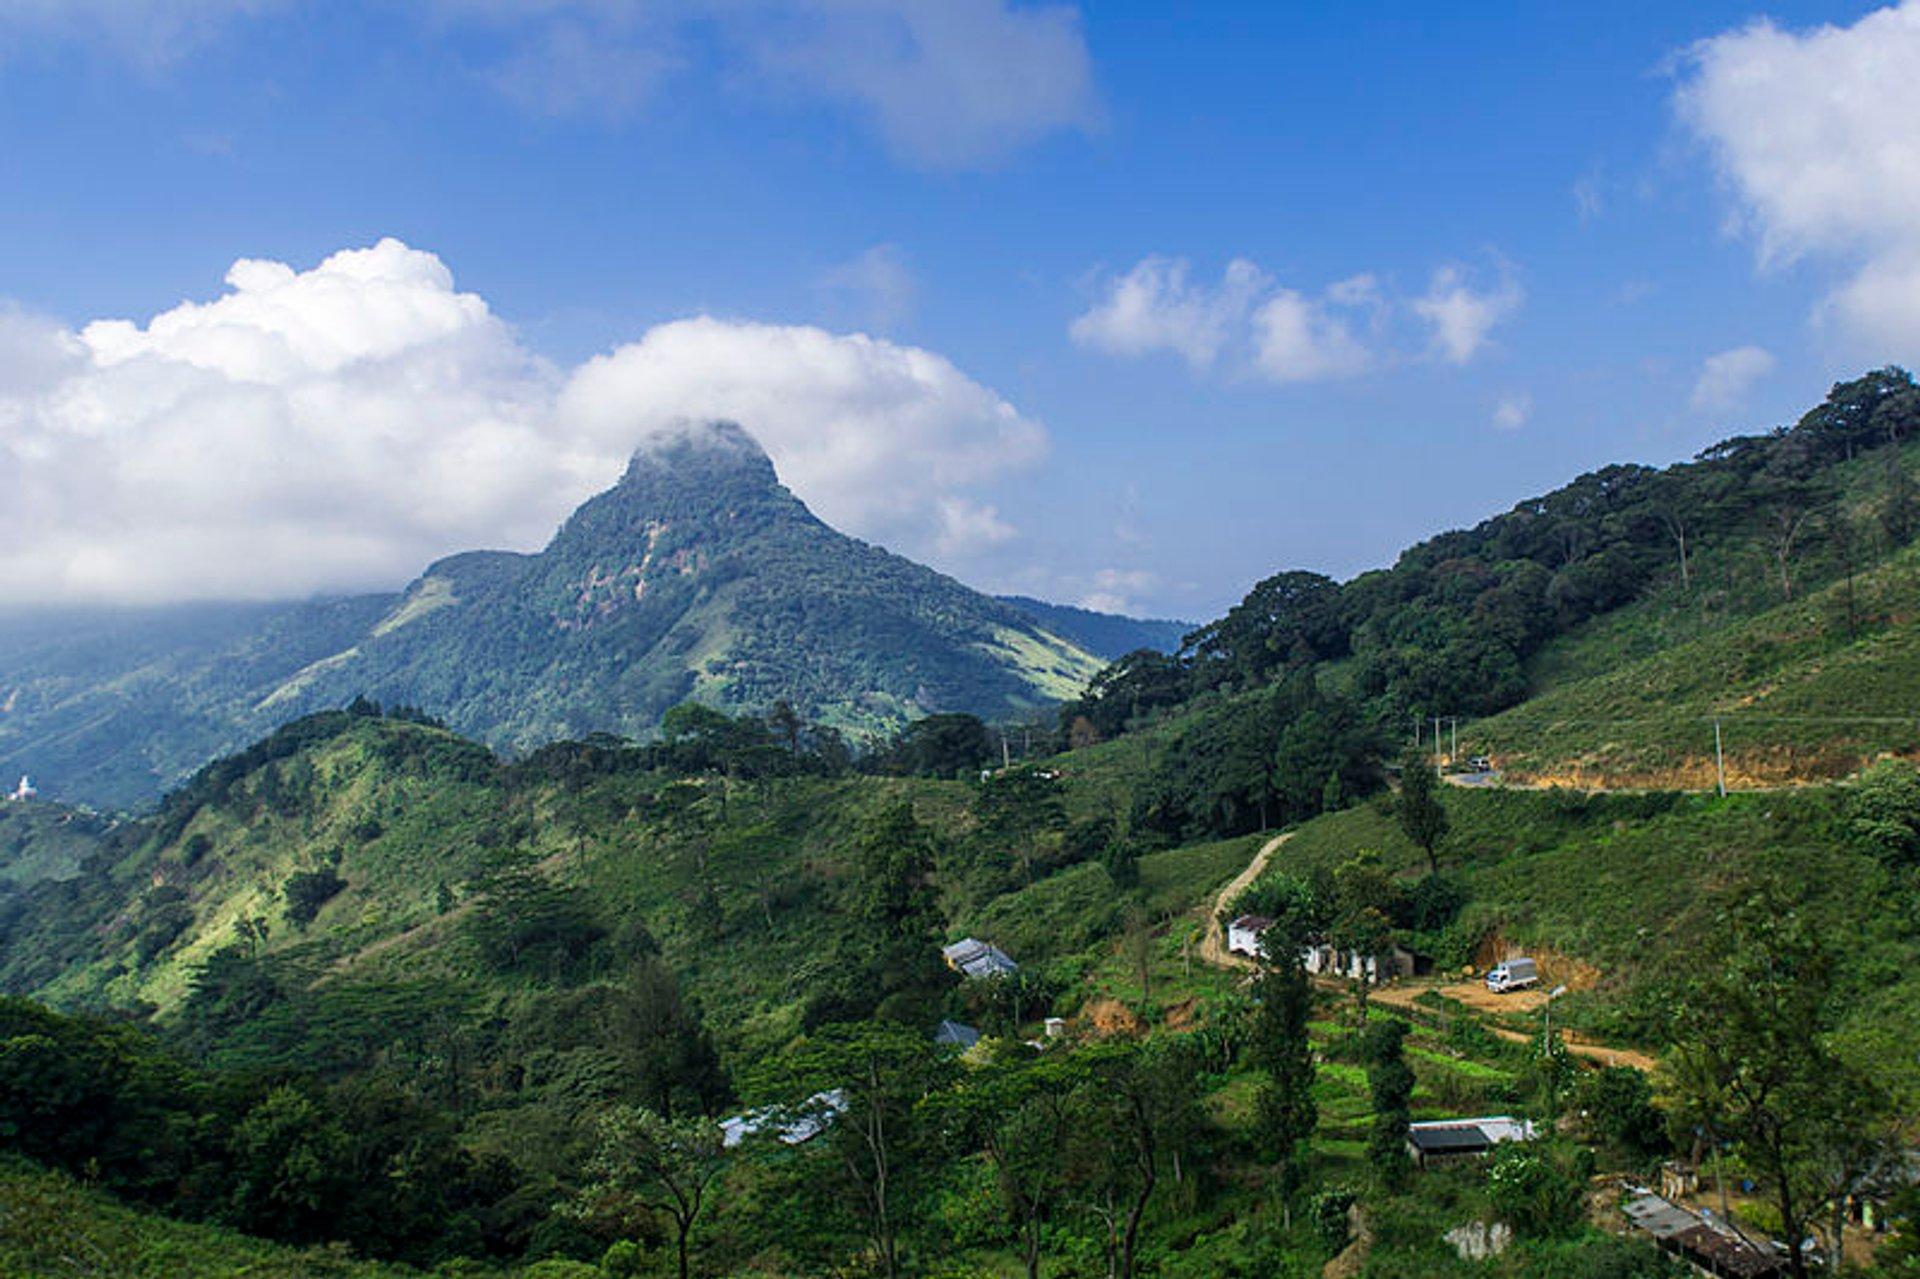 Trekking in the Knuckles Range  in Sri Lanka 2020 - Best Time